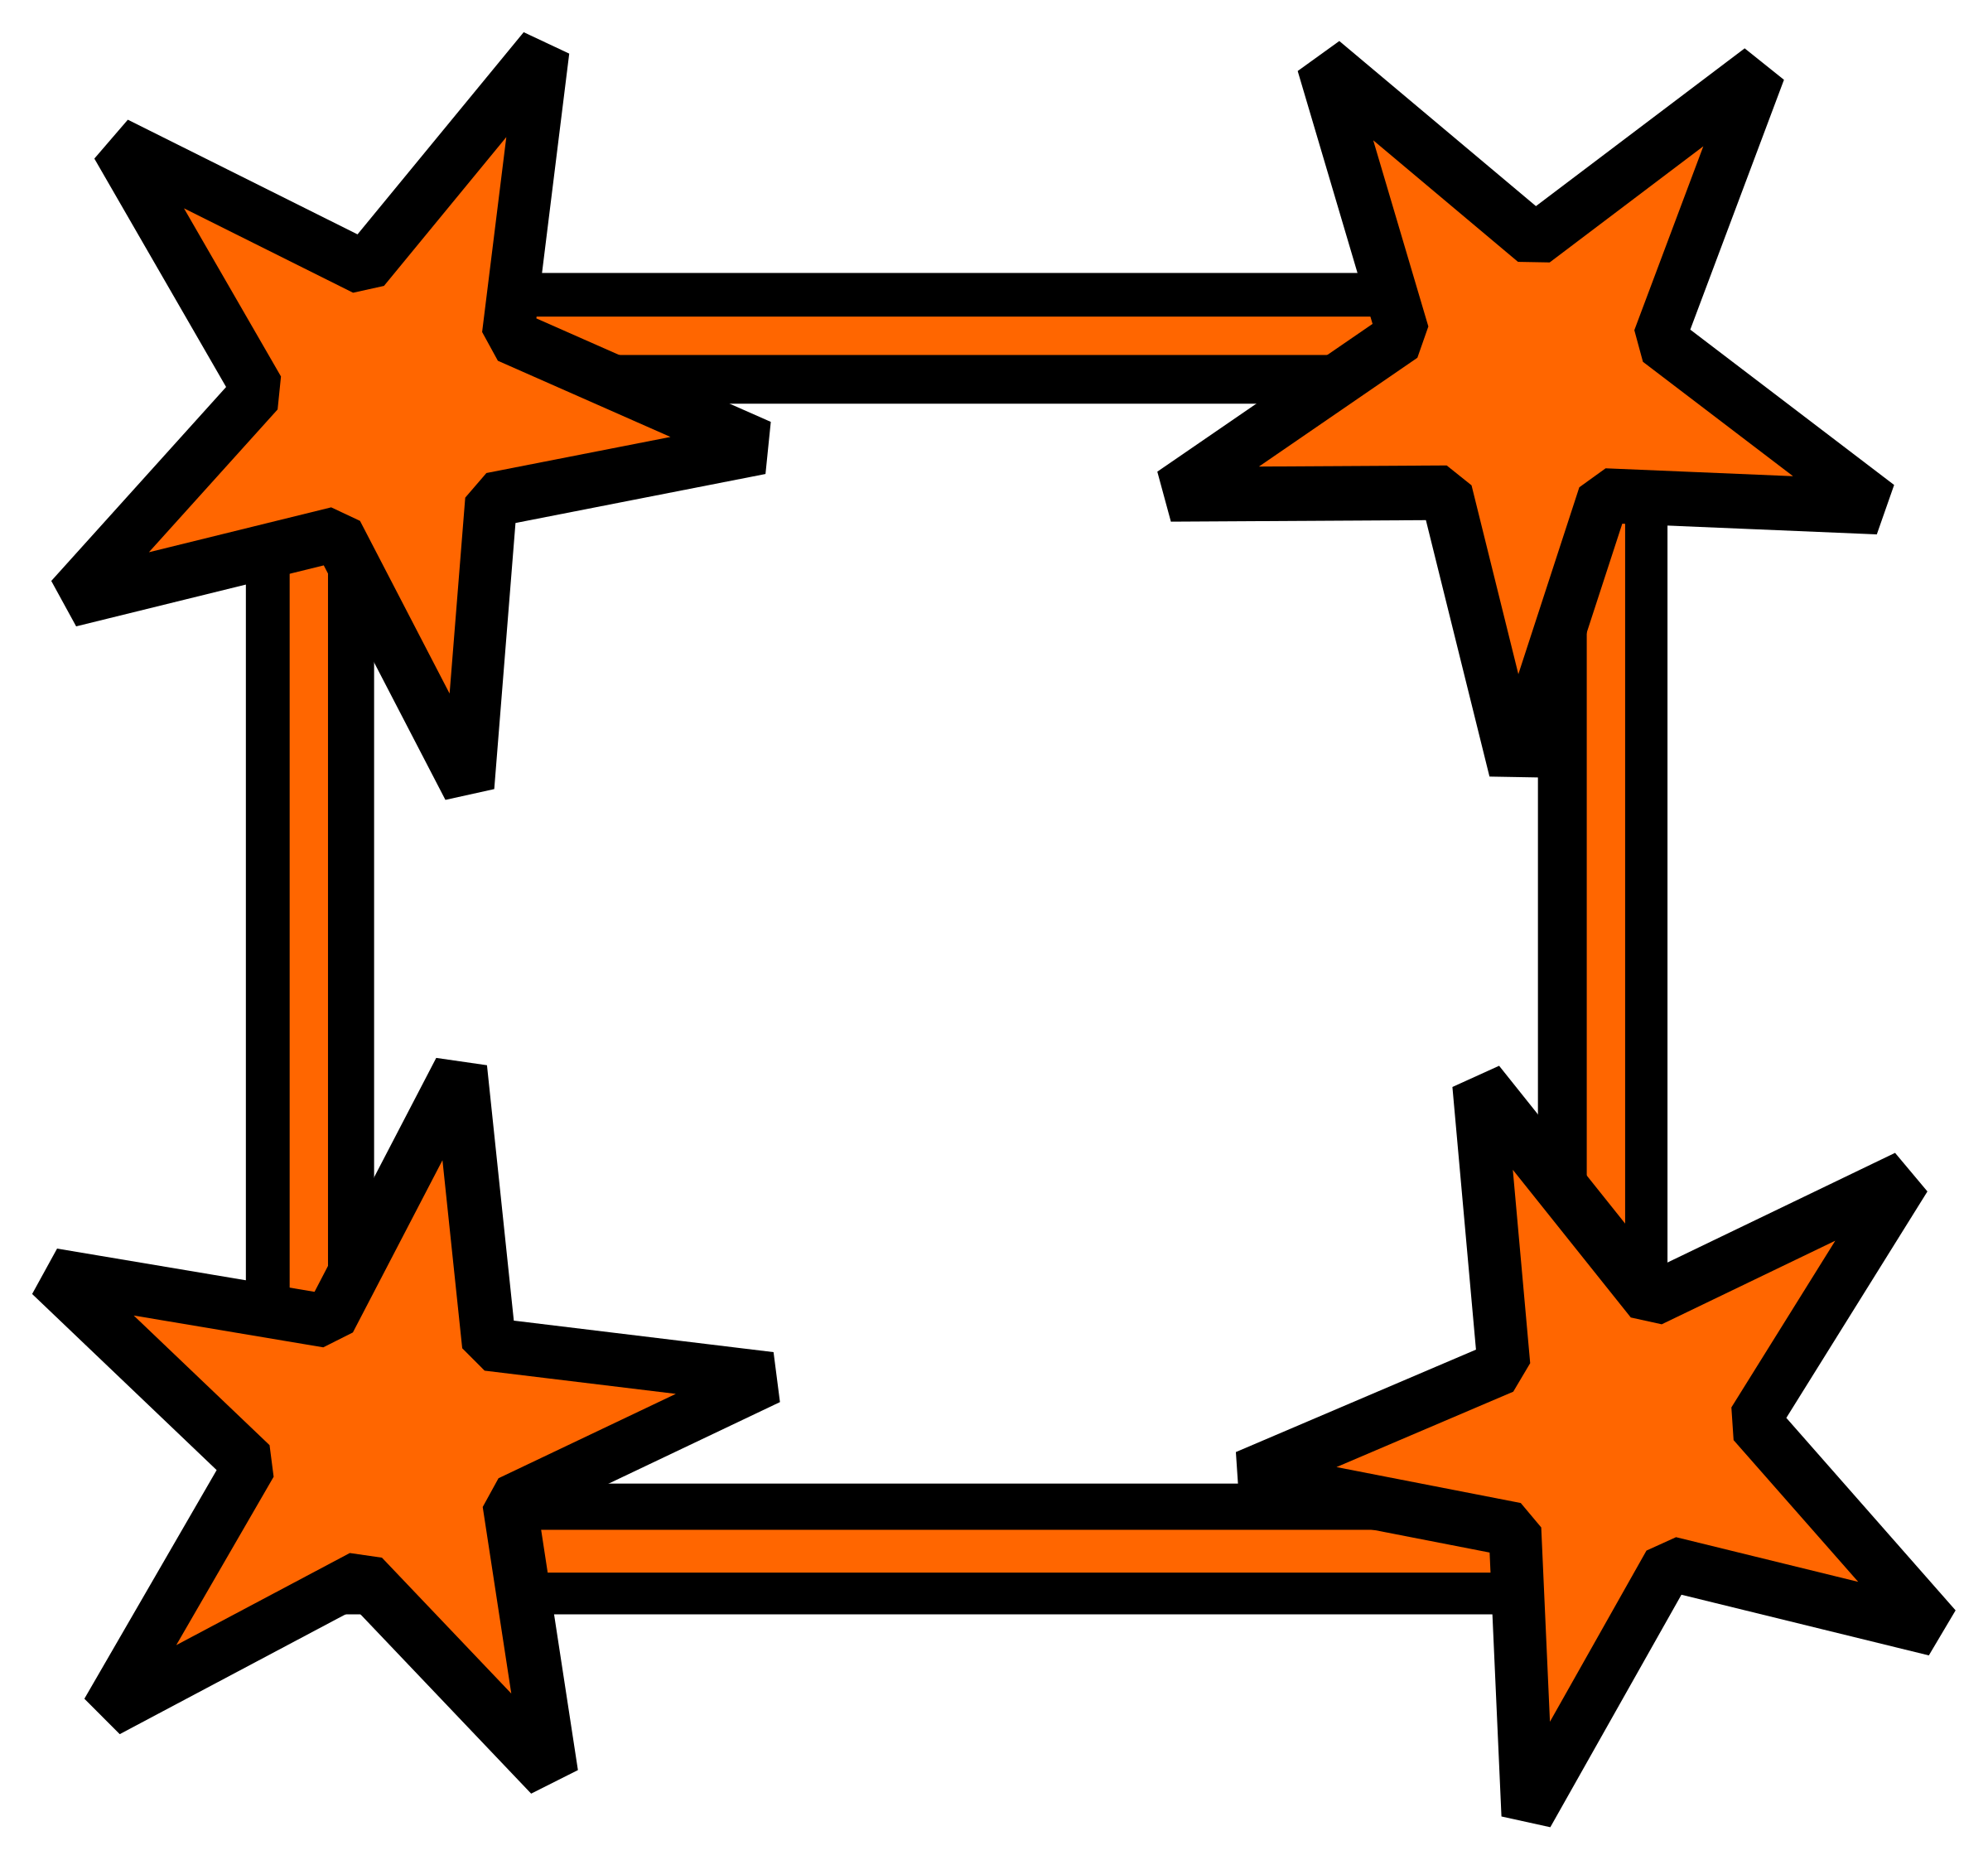 Simple star cornered big. Clipart cross frame